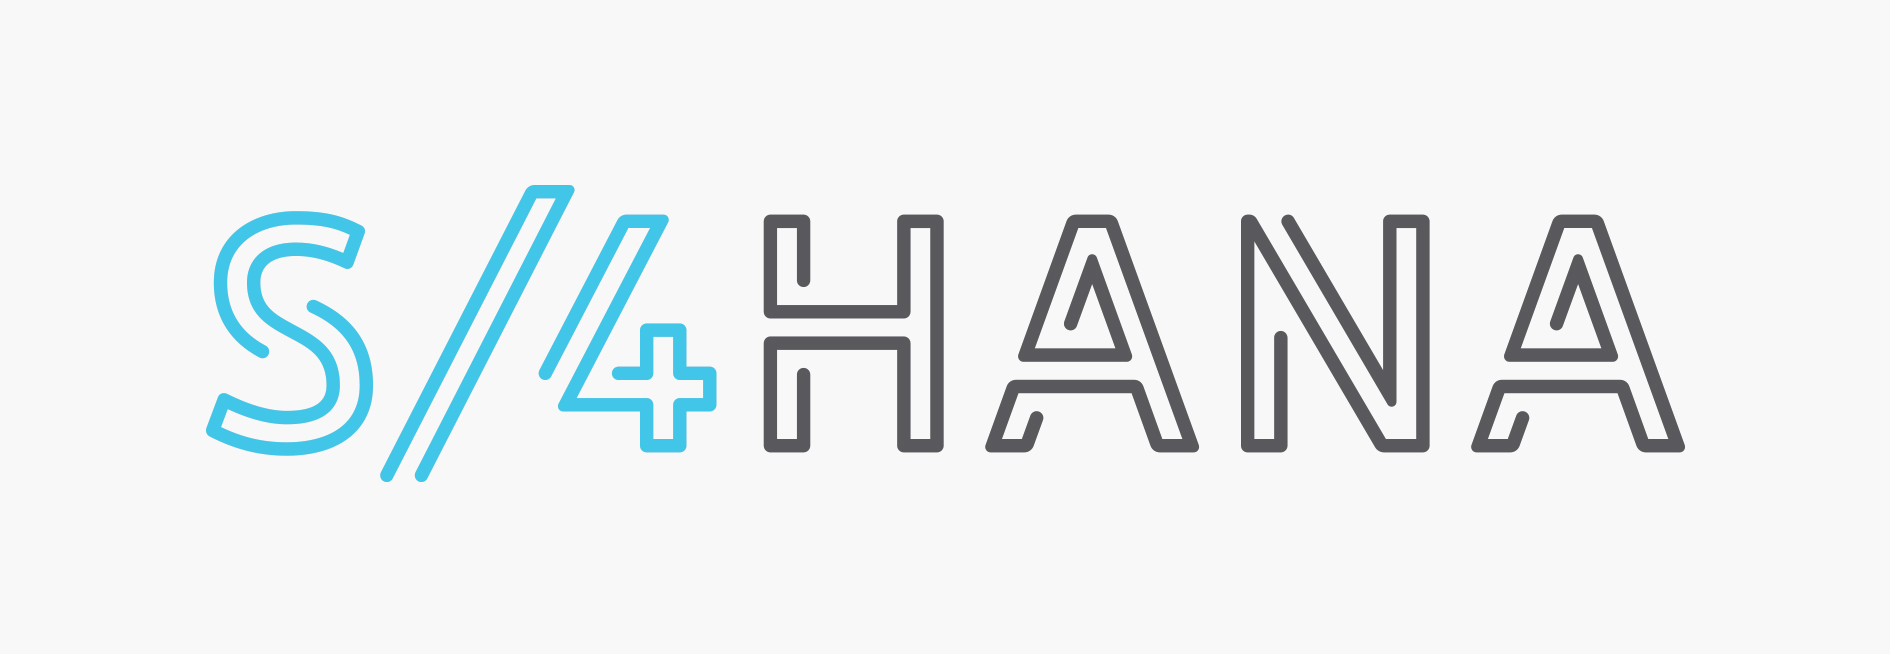 S4HANA-Logo.jpg